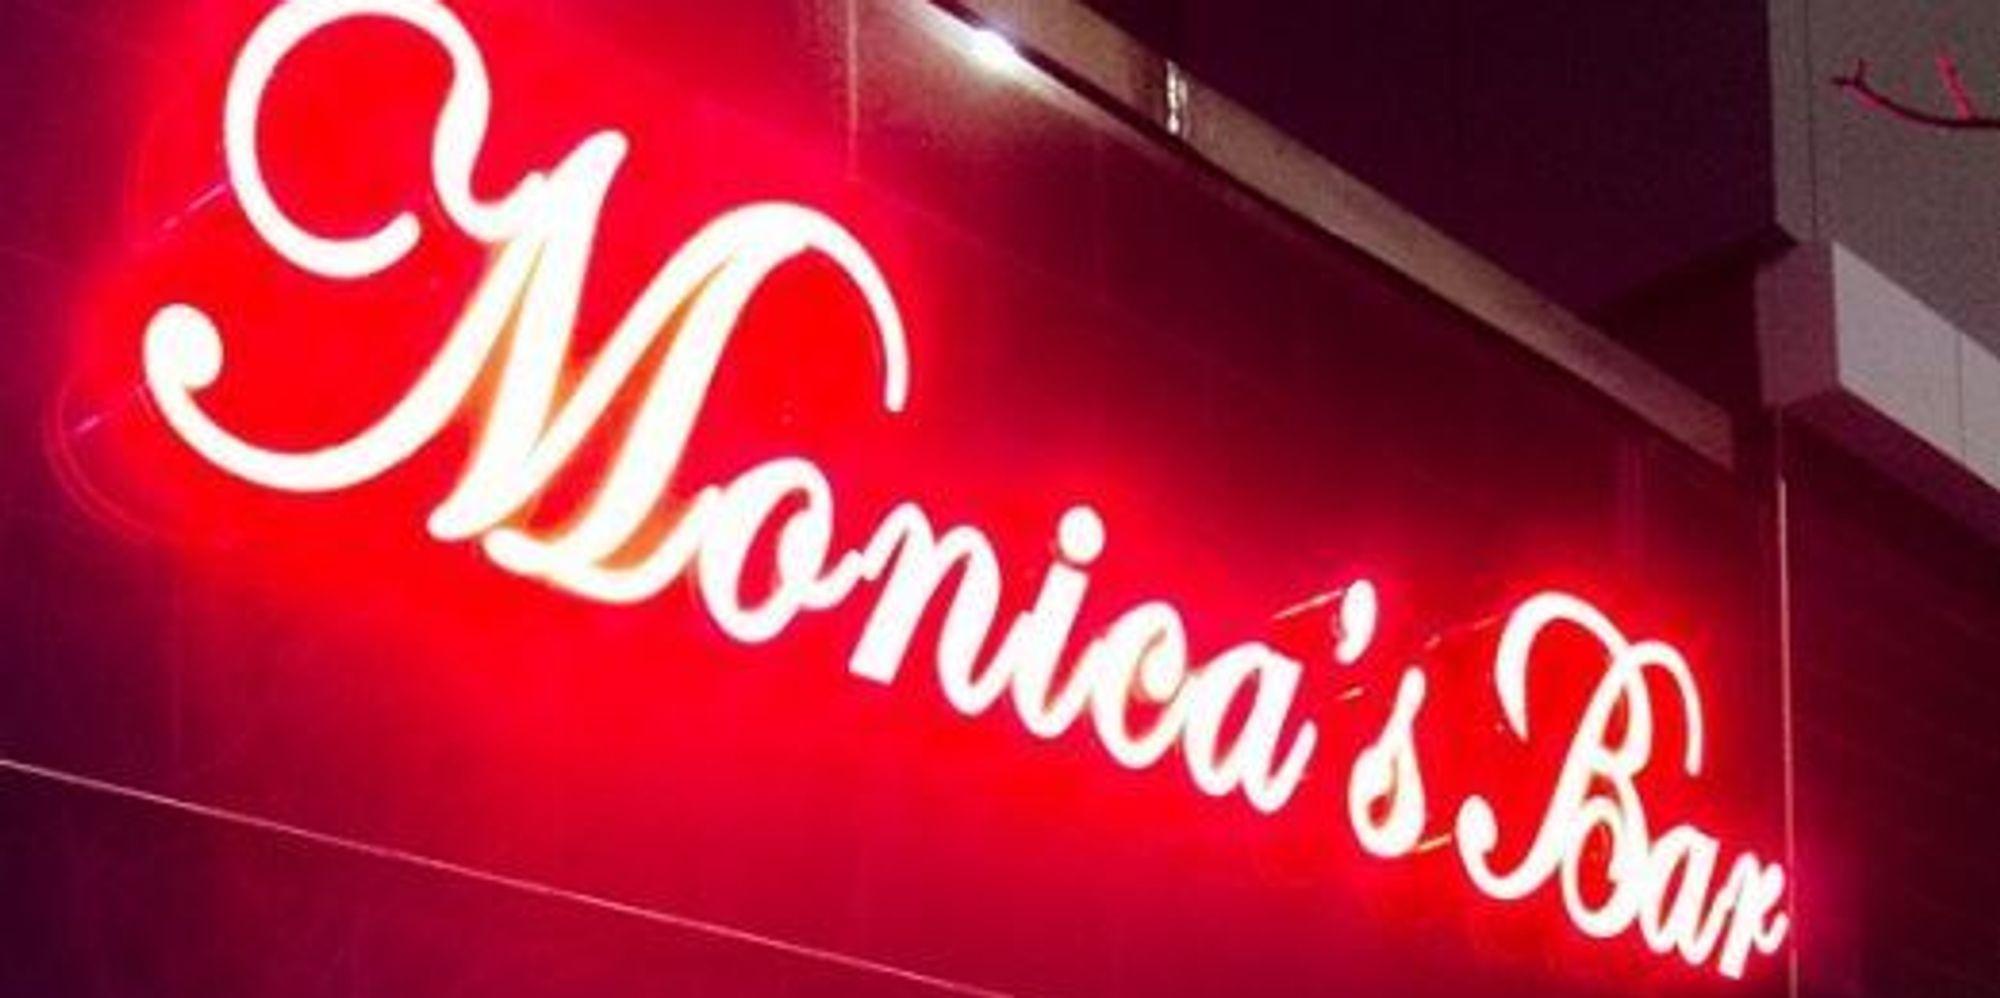 Toronto has had Enough of Monica's Bar and their Racist Staff. #ShutEmDown